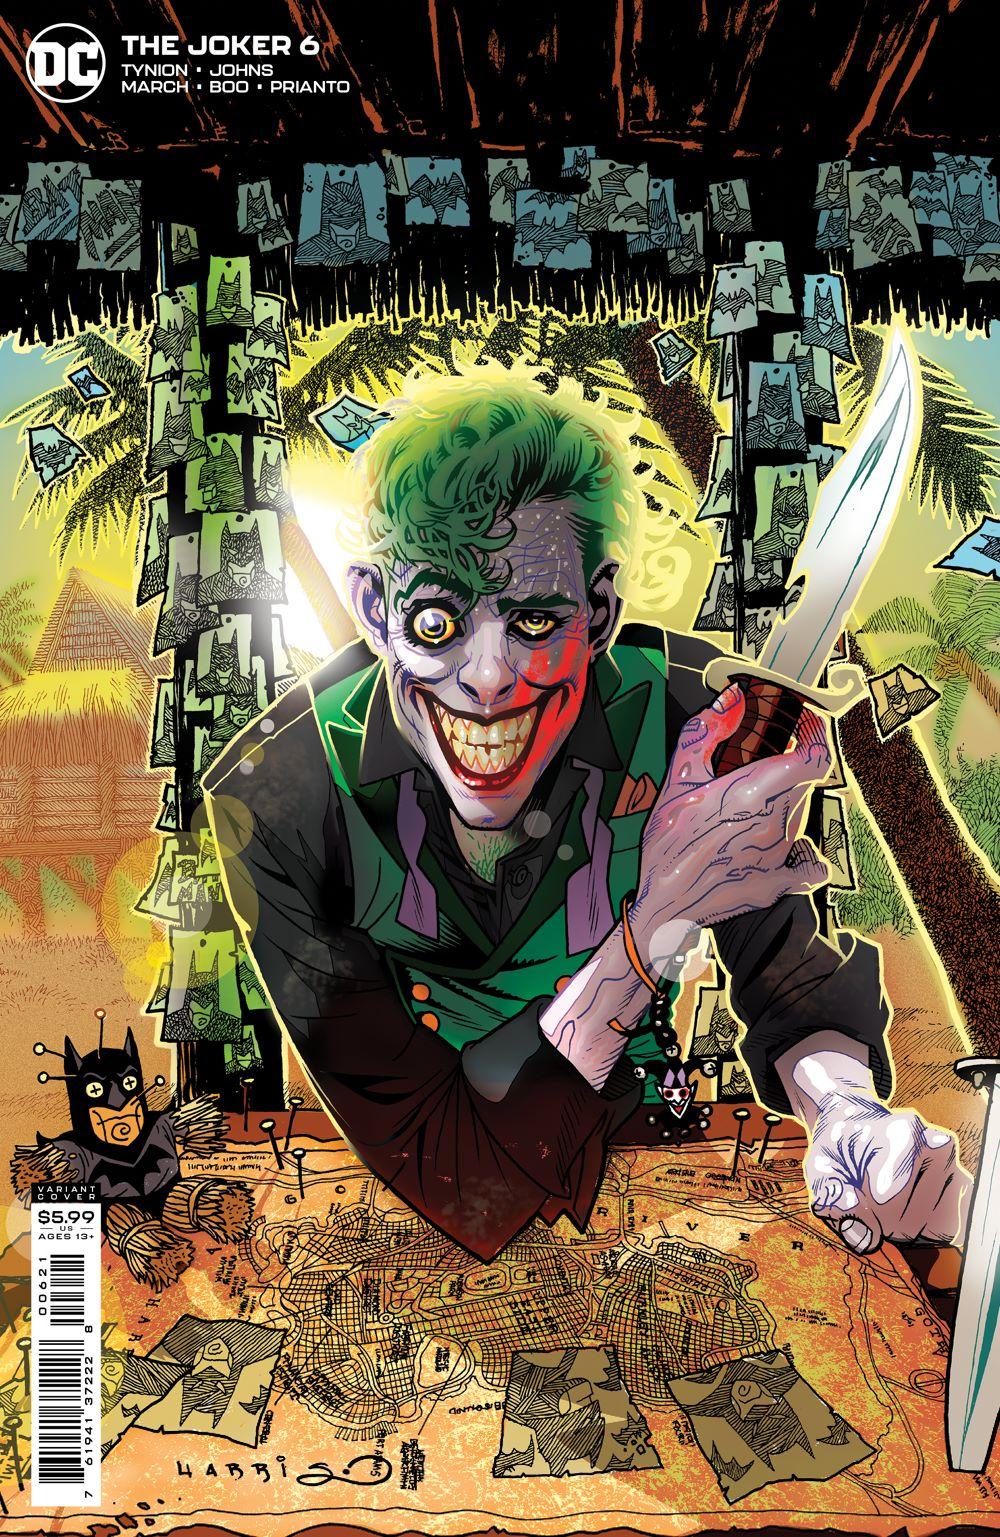 JKR_Cv6_var_00621 DC Comics August 2021 Solicitations